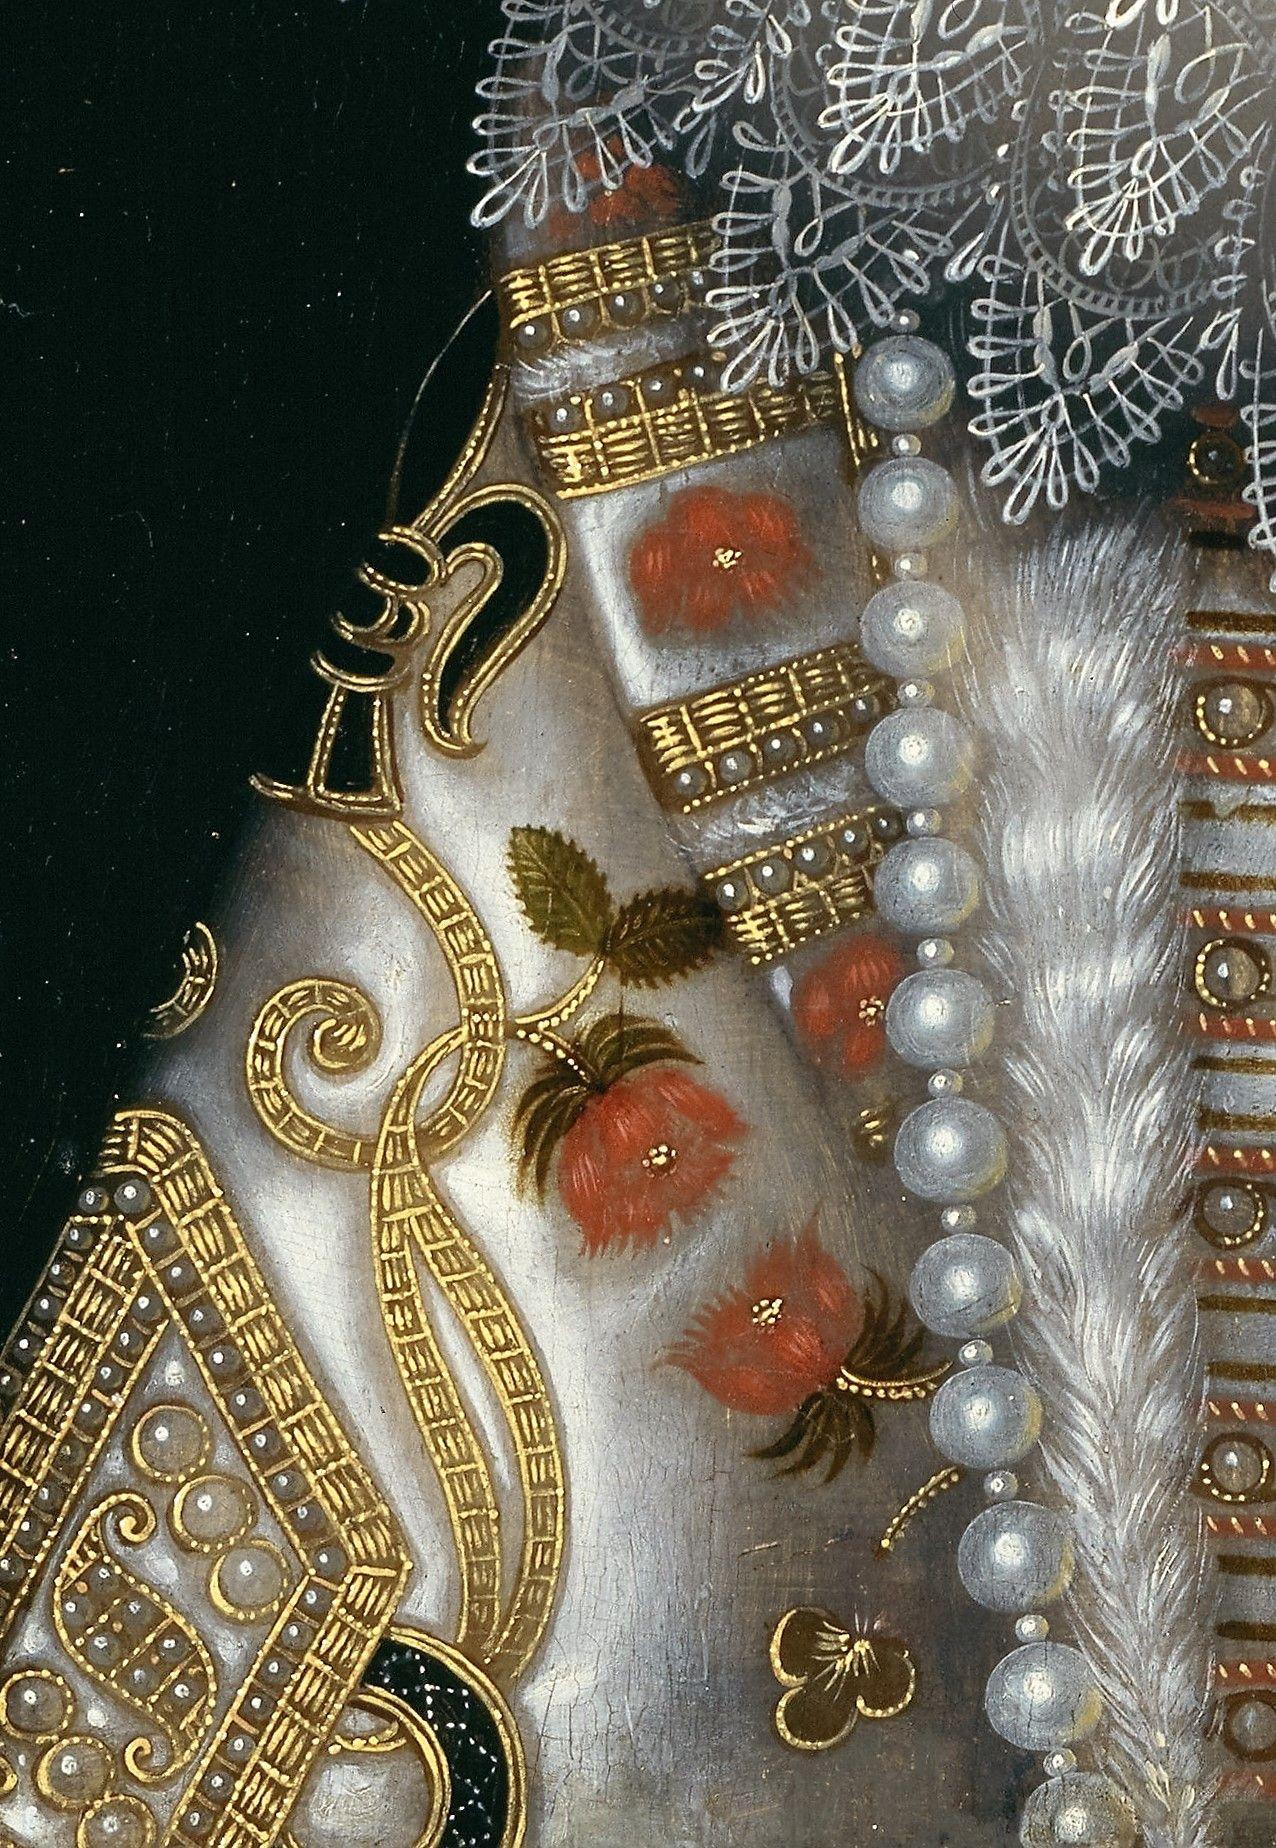 Isabelle d'Espagne - Frans Pourbus le Jeune - as pérolas estavam omnipresentes nas peças de Joalharia deste período